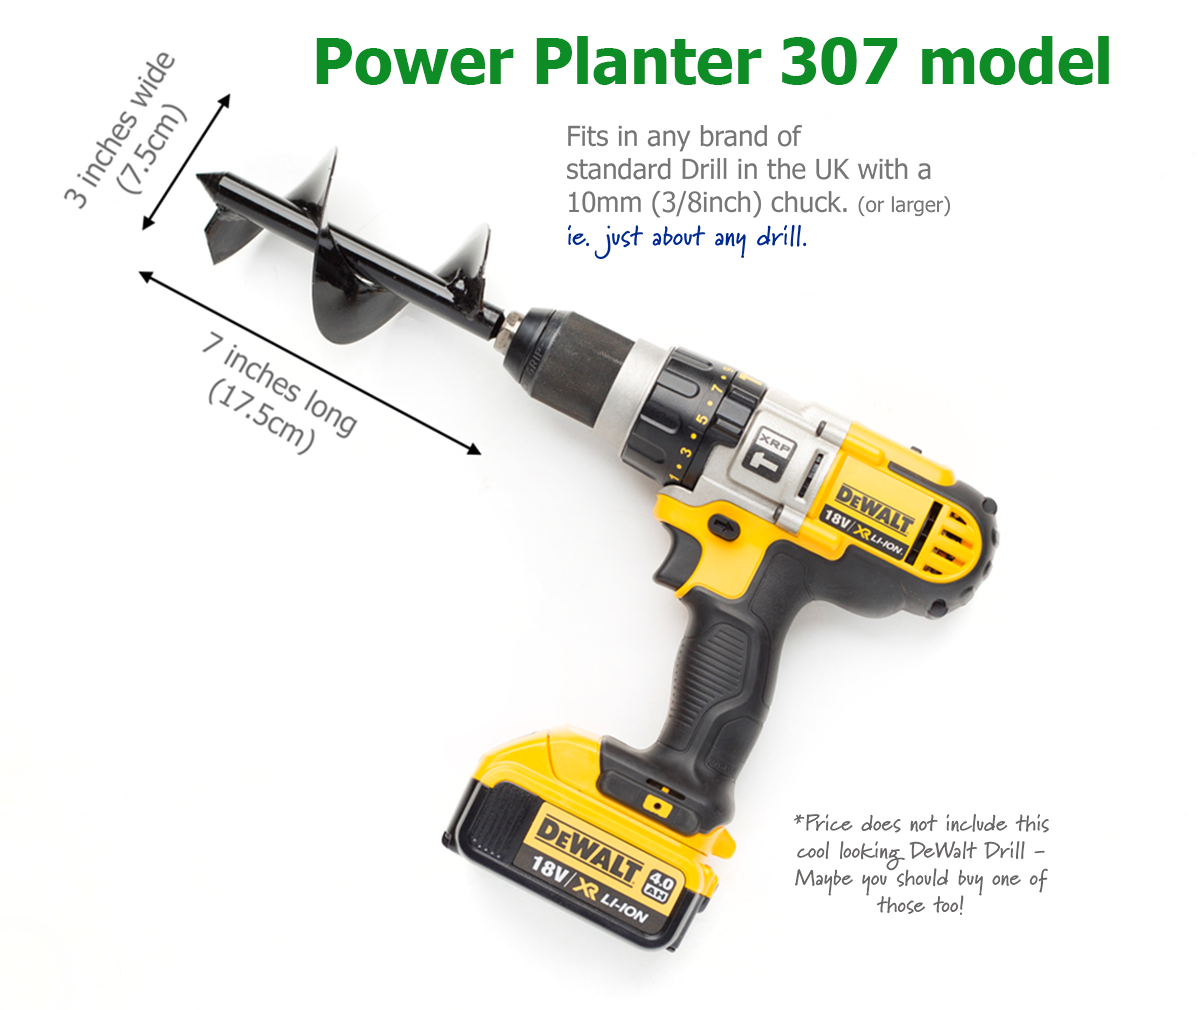 307 Power Planter